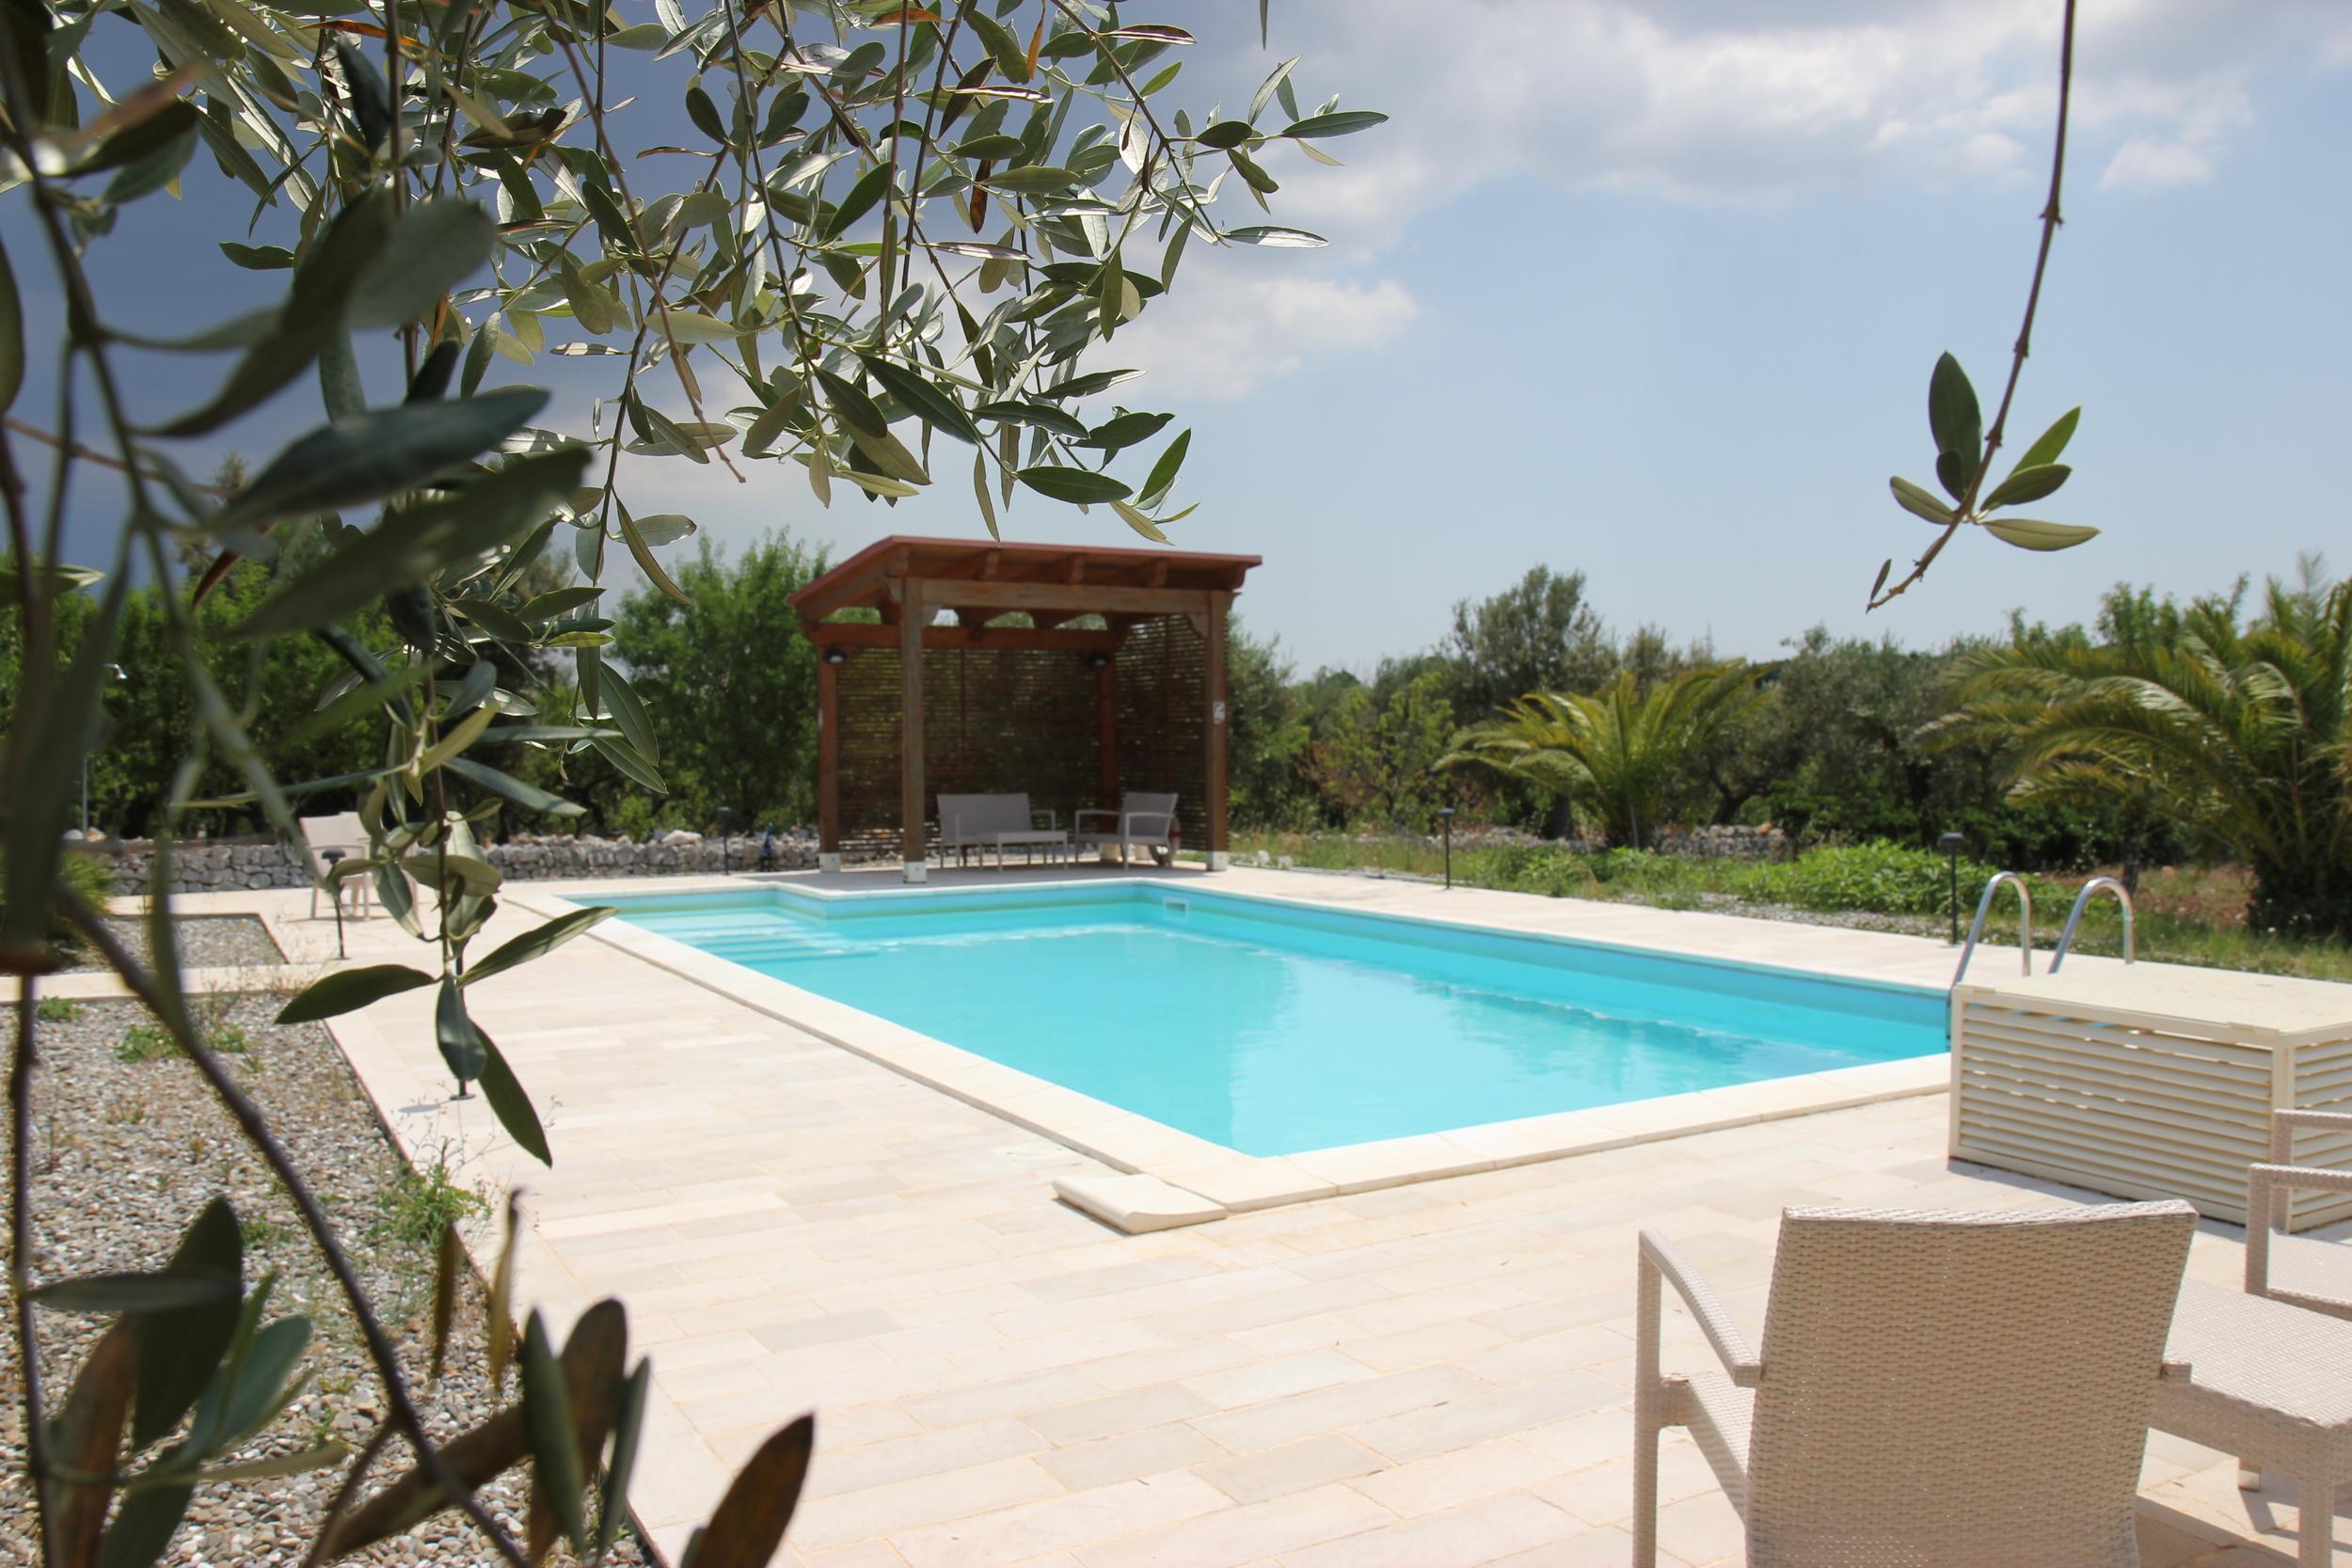 Puglia 2015-06 261.JPG